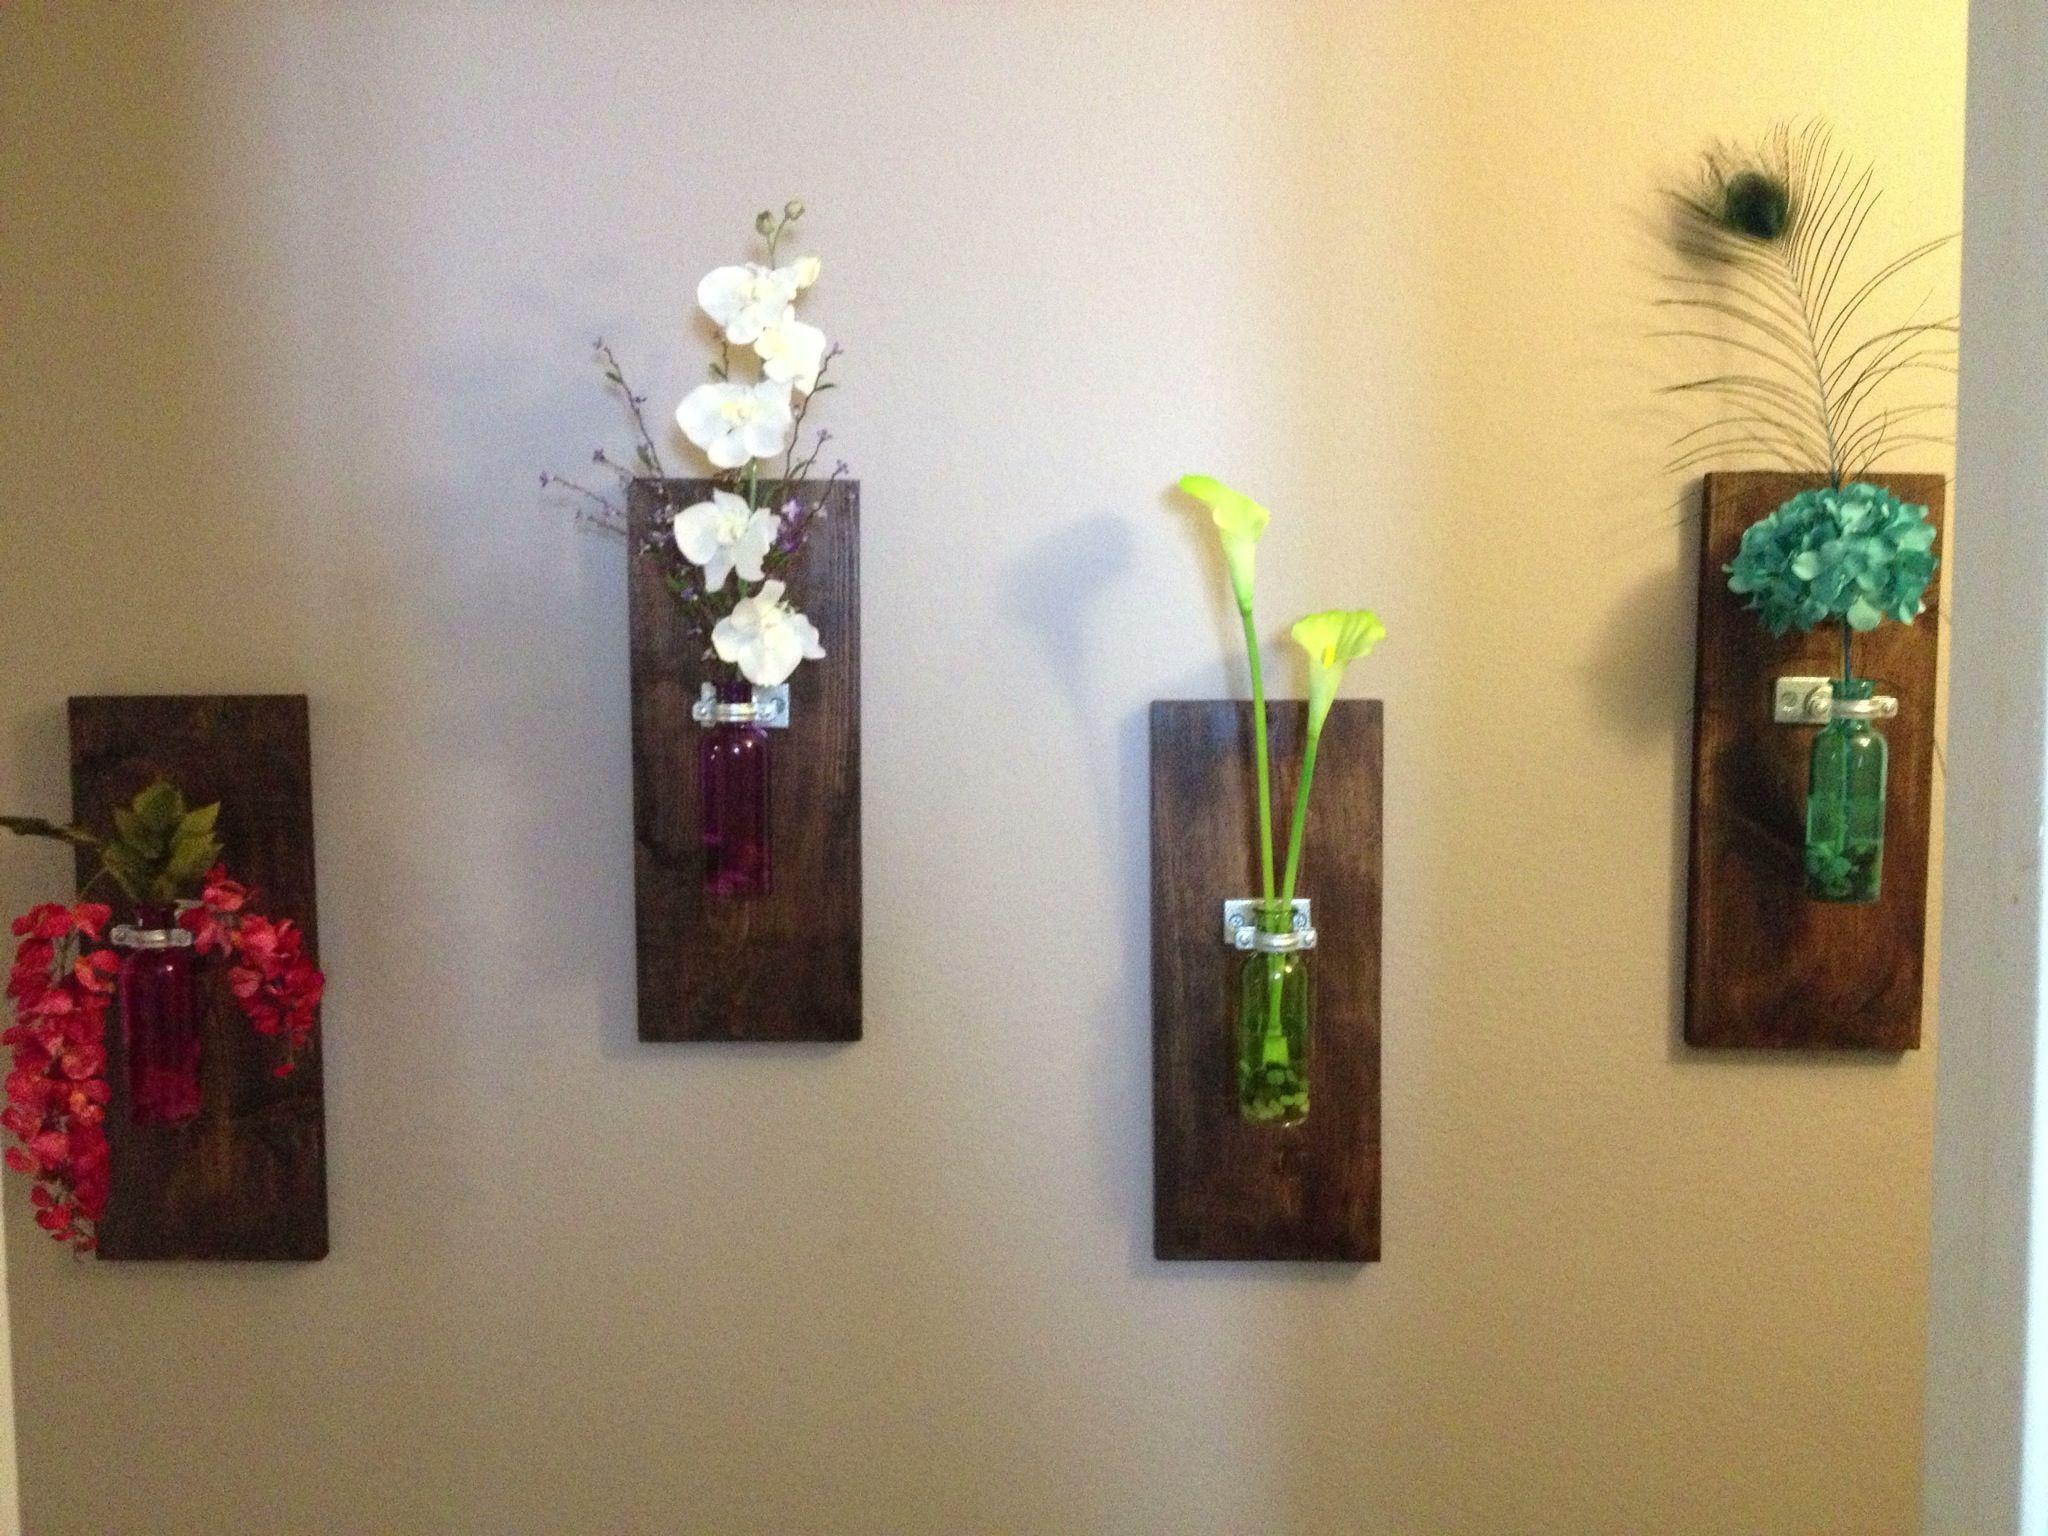 DIY wall hanging vase I made this weekend. Hallway looks good!